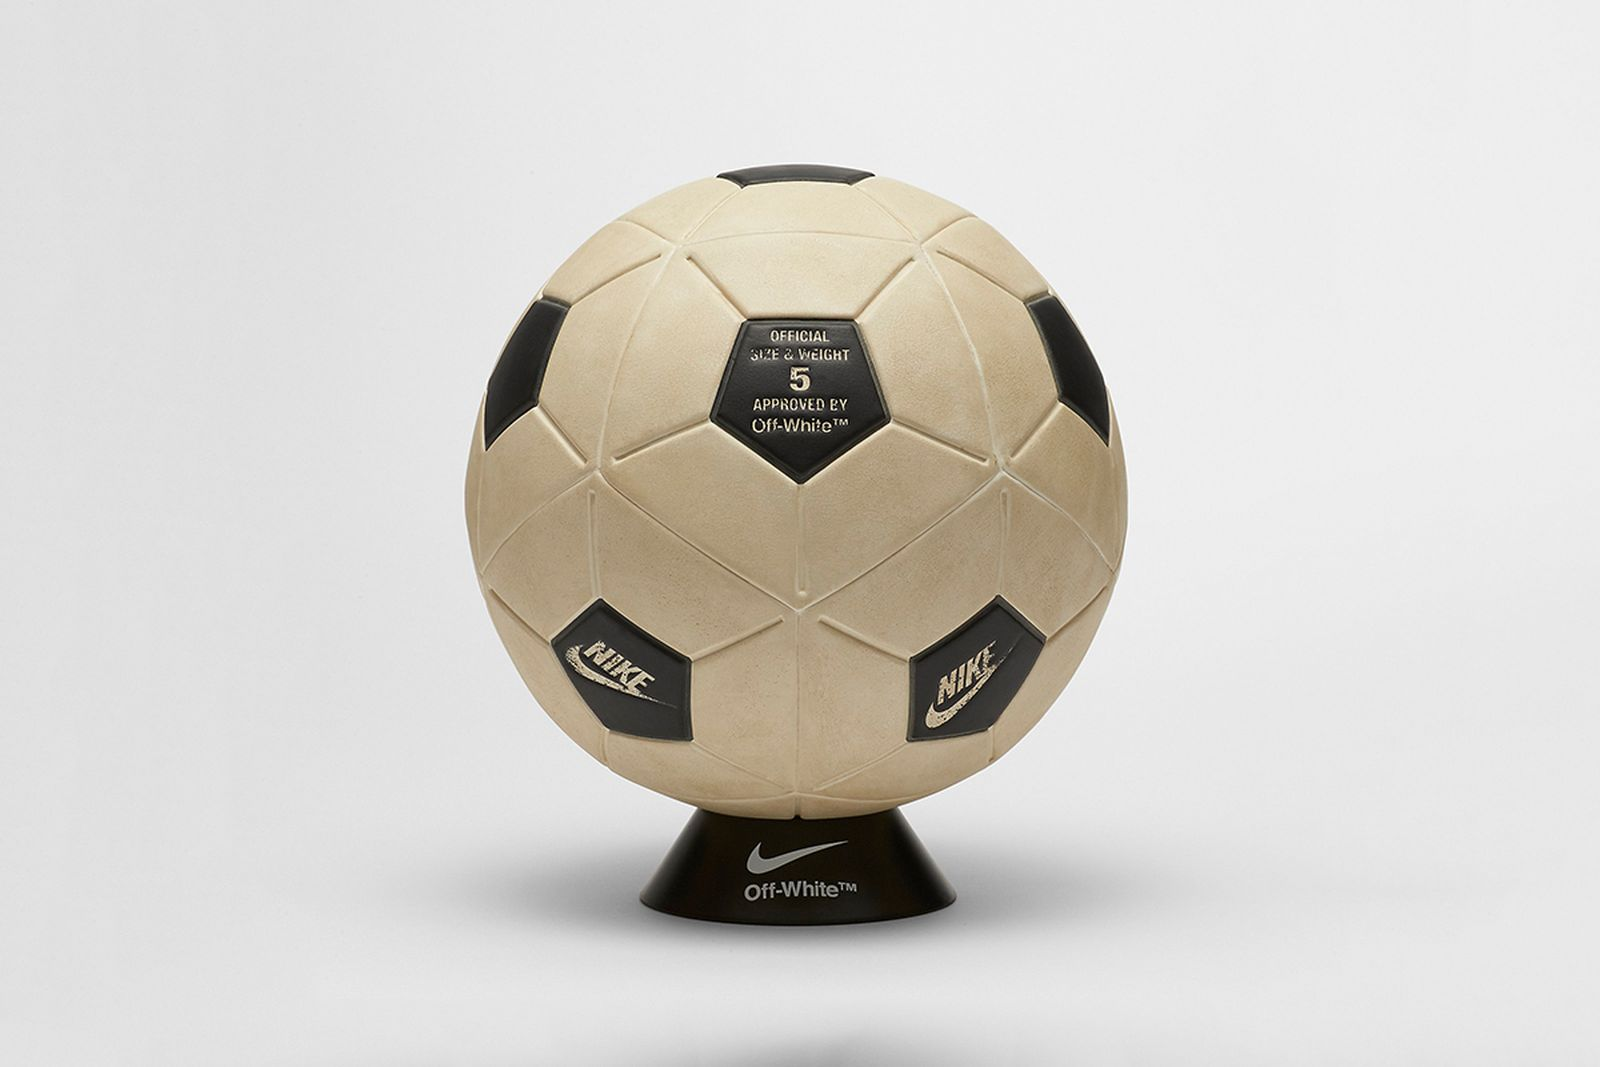 soccer ball 2018 FIFA World Cup Nike OFF-WHITE c/o Virgil Abloh